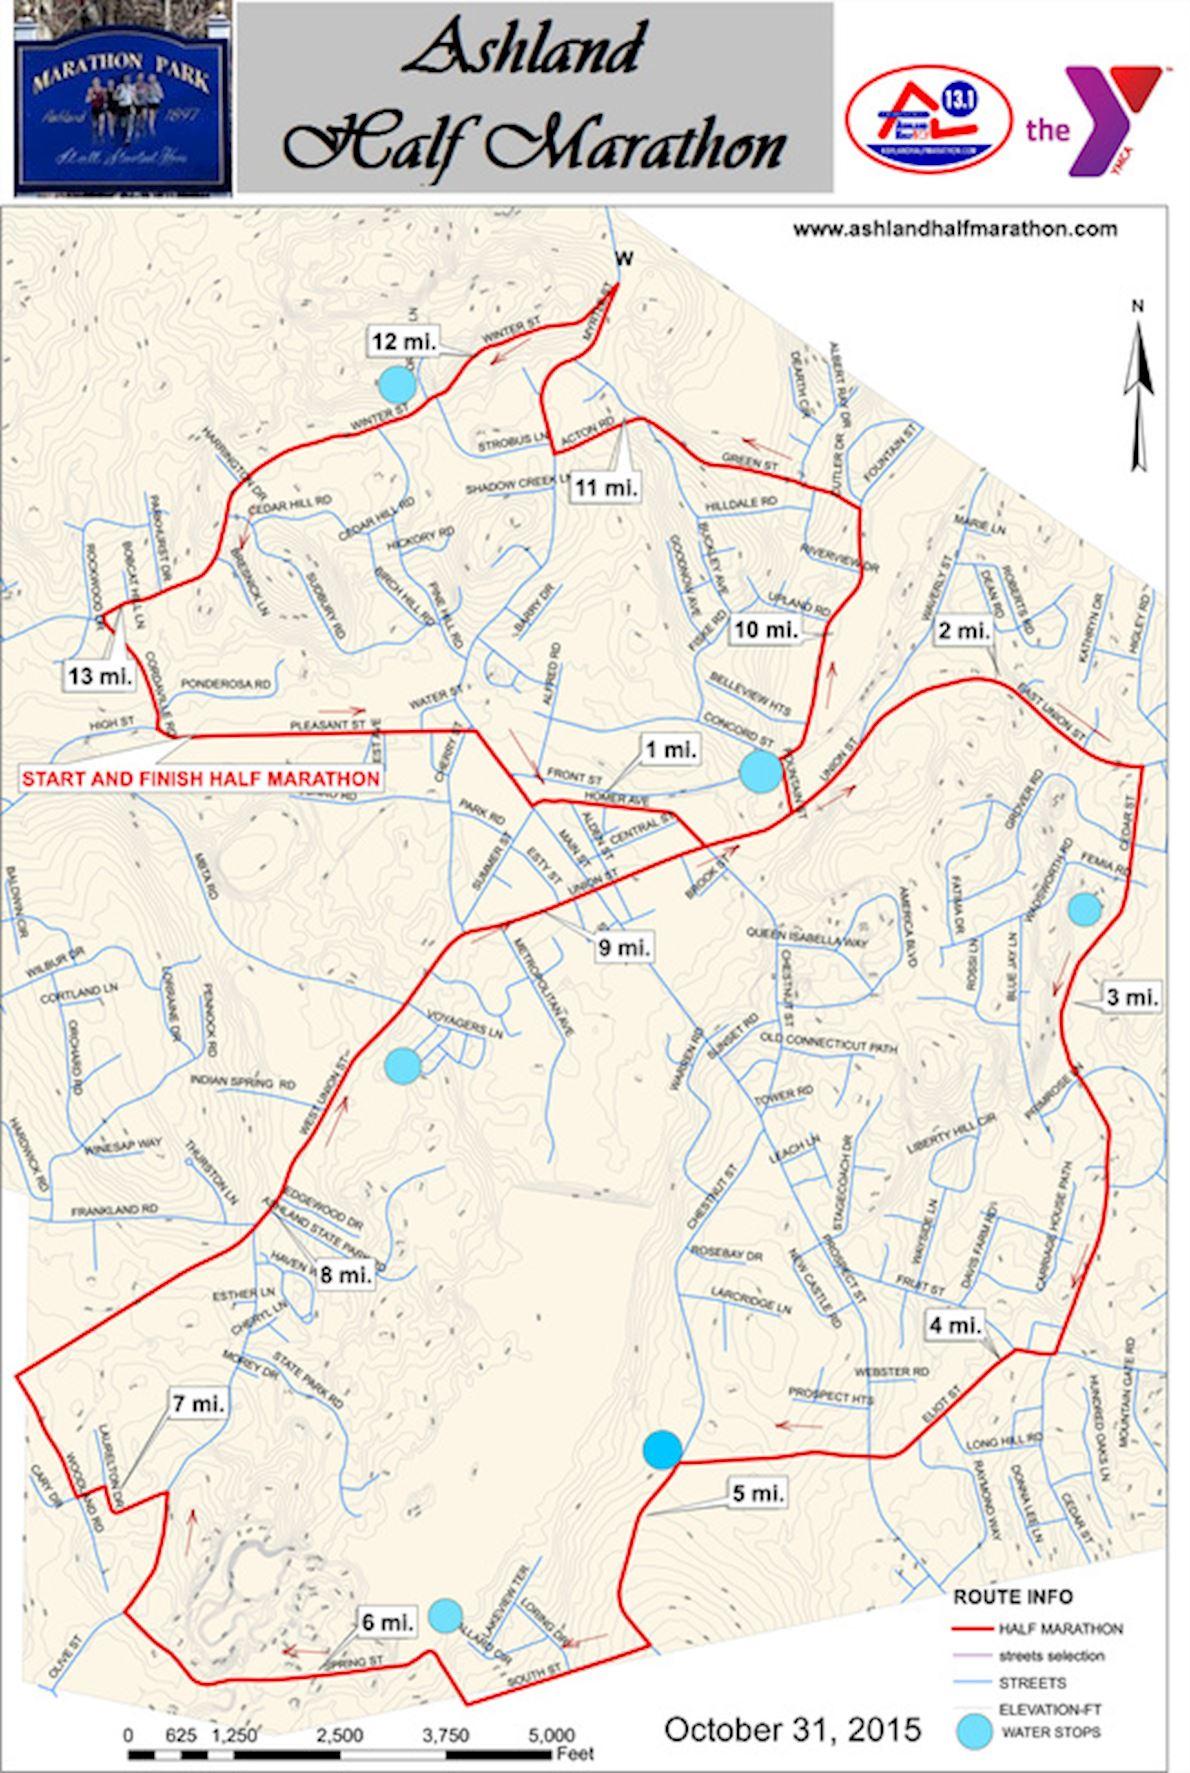 Ashland Half Marathon Route Map